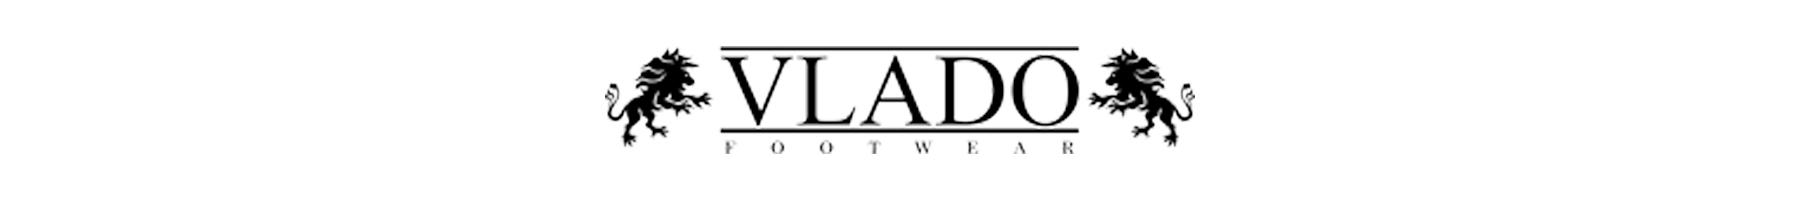 DrJays.com - Vlado